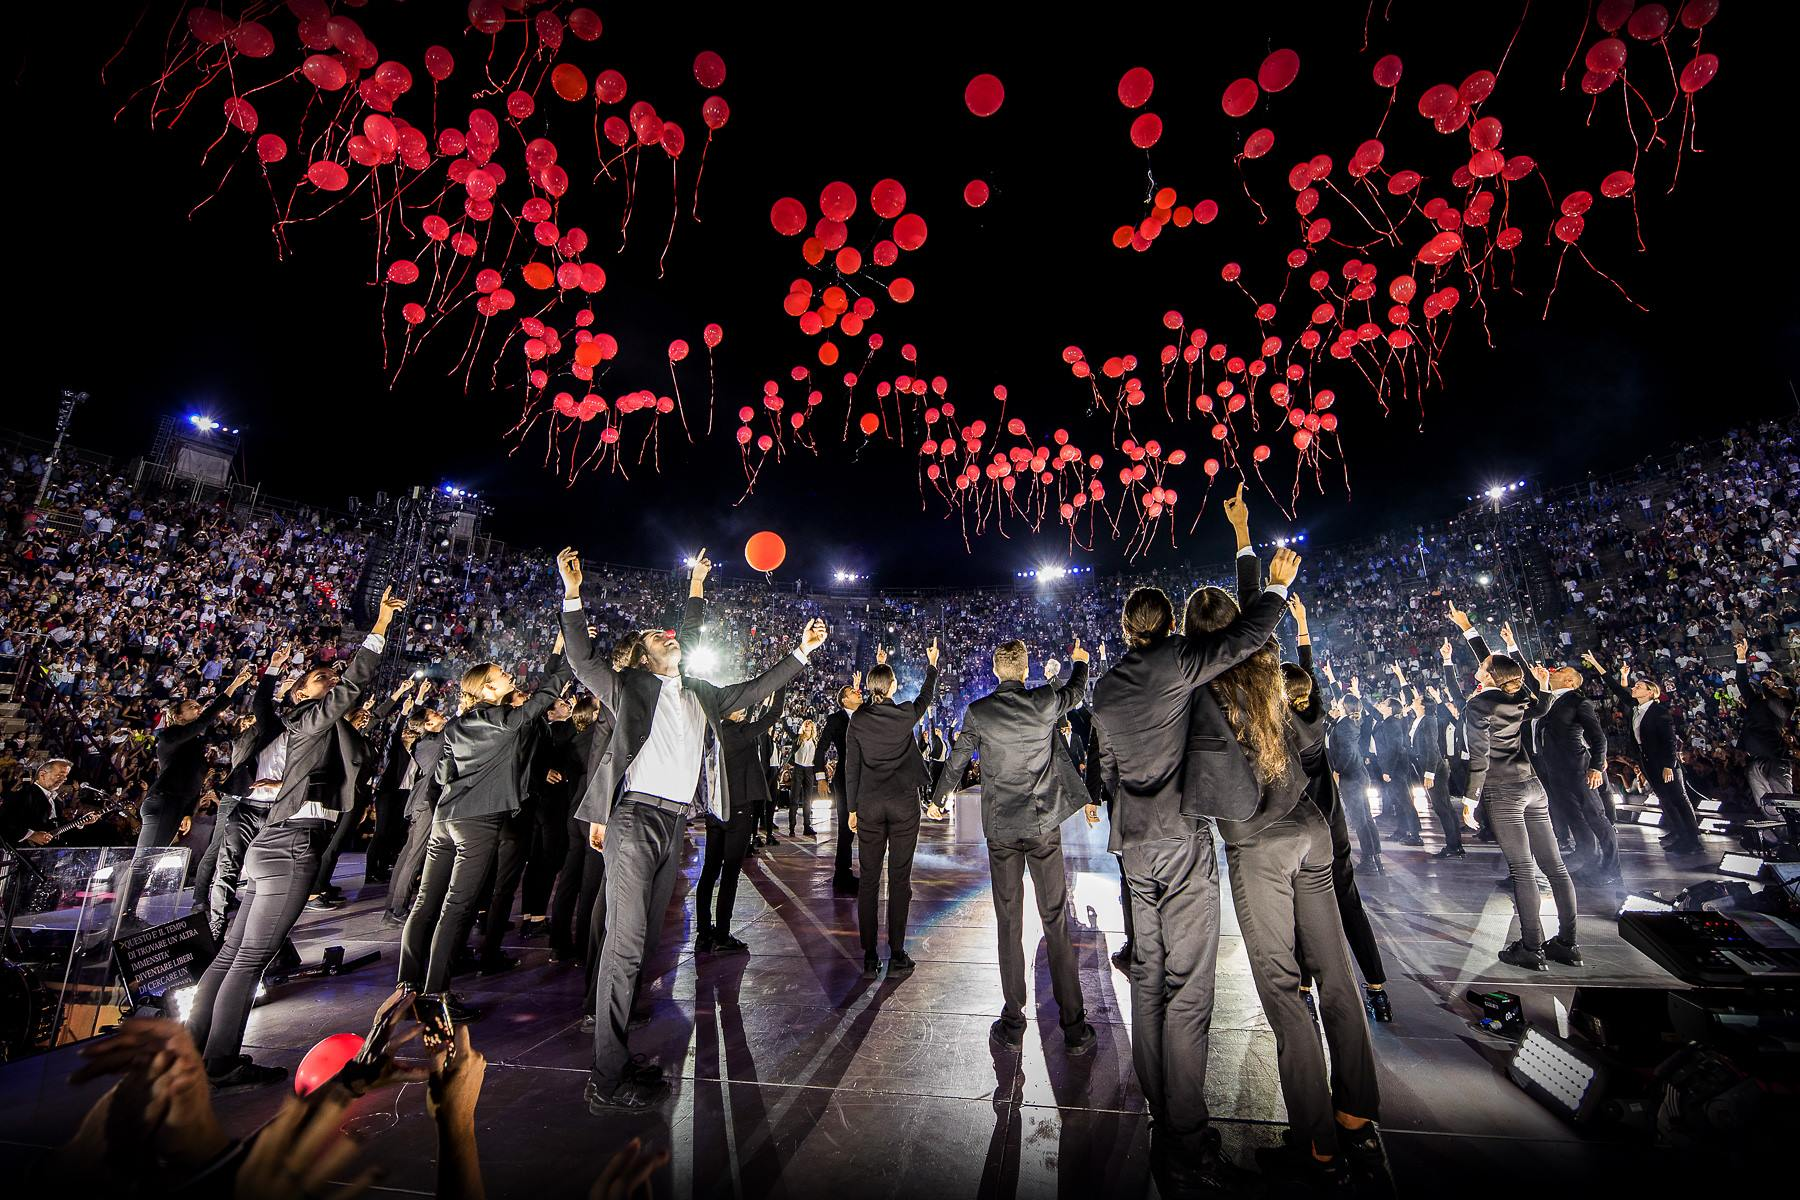 claudio baglioni arena di verona italia italy 50 al centro highline trickline show funambule circus performance spectacle suisse Slackline Lyell Grunberg  (8).jpg